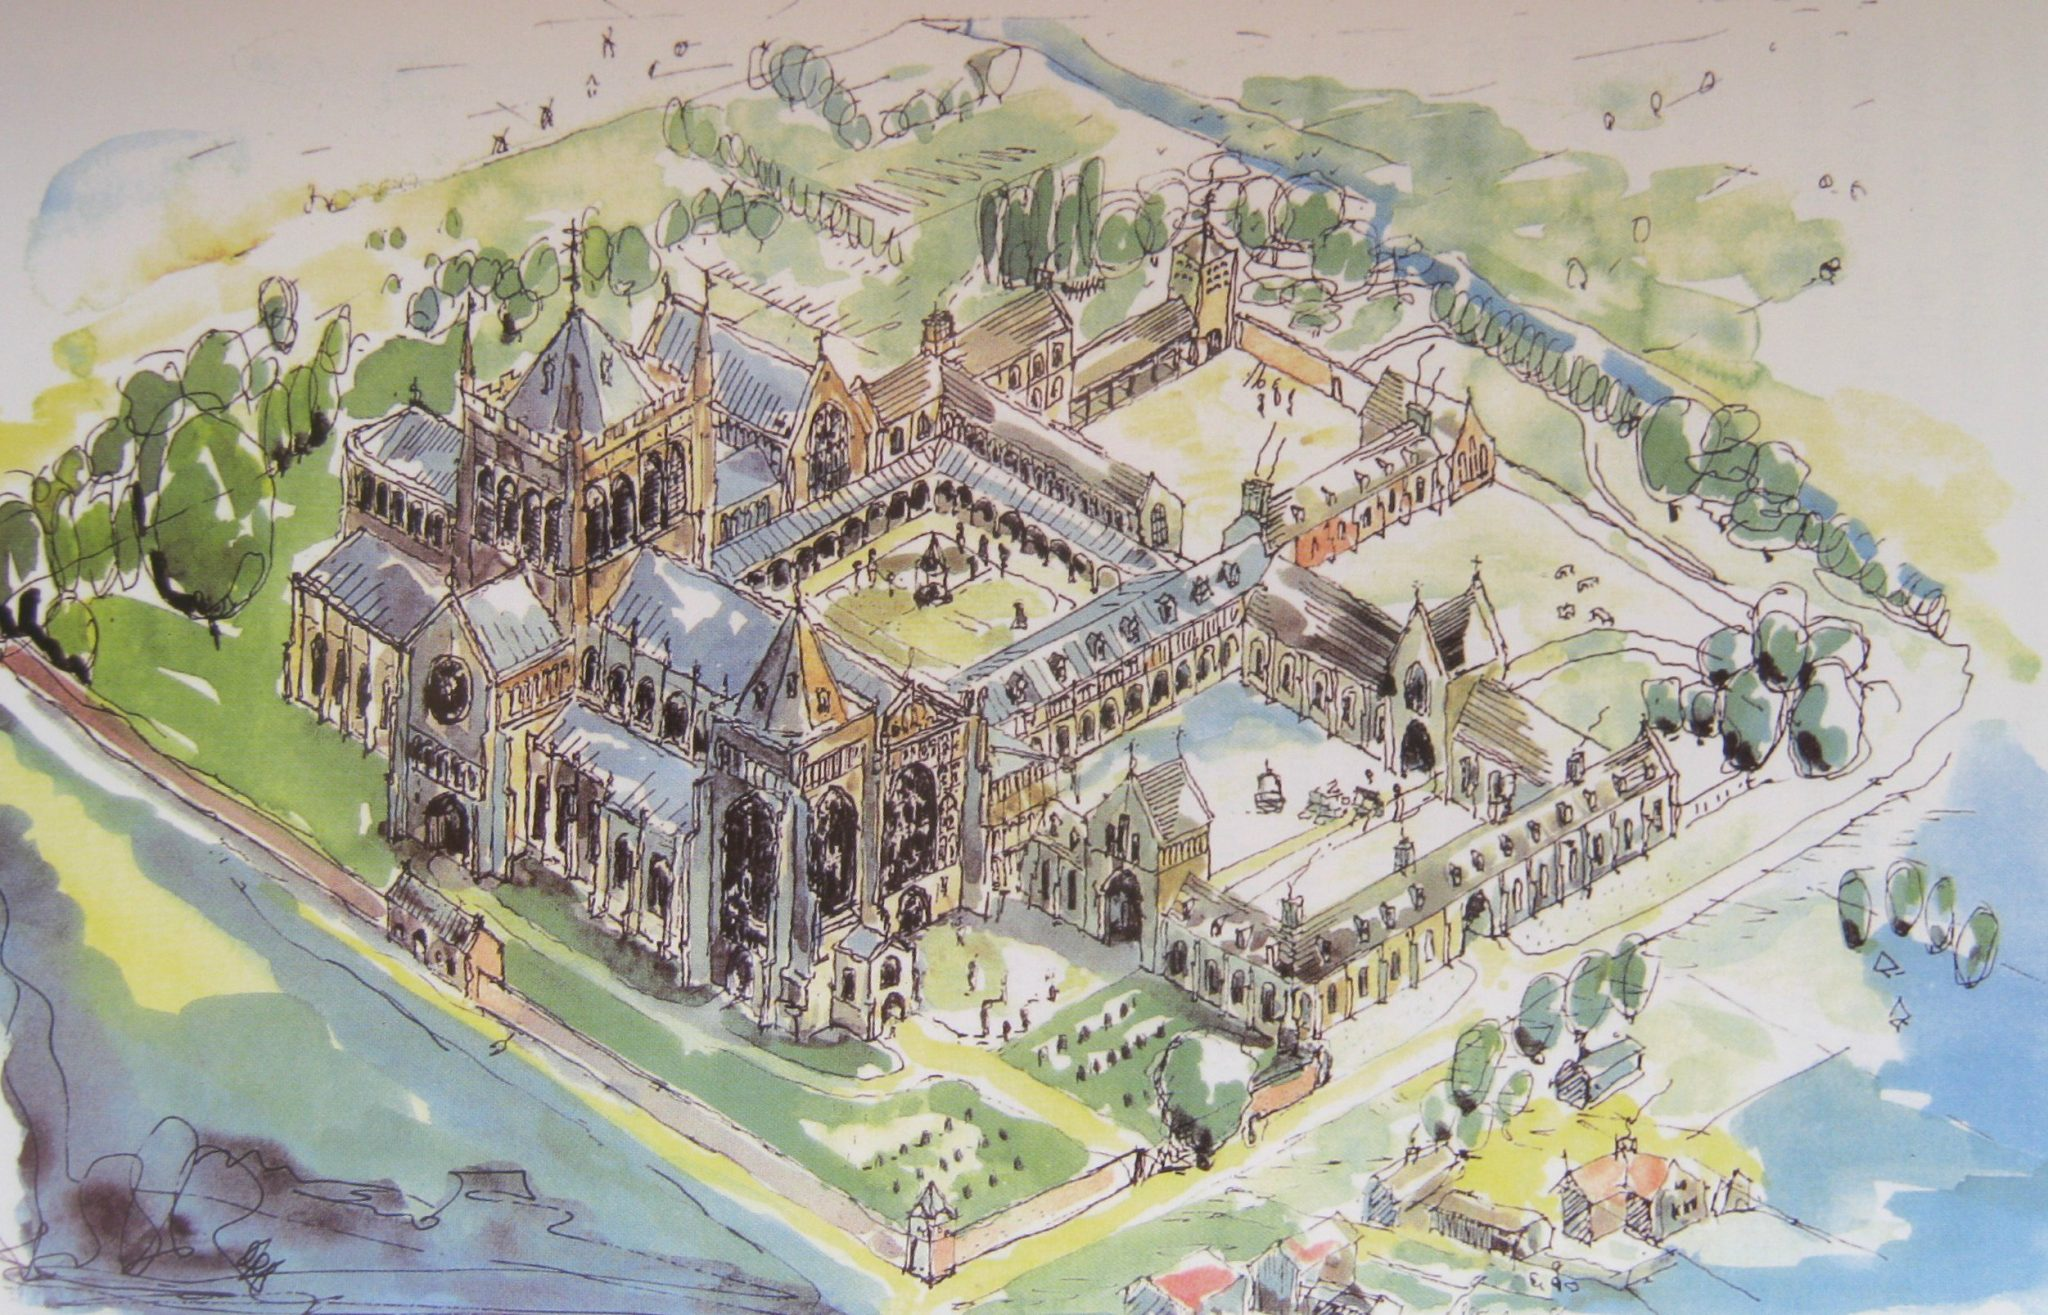 Artist's impression of Croyland Abbey